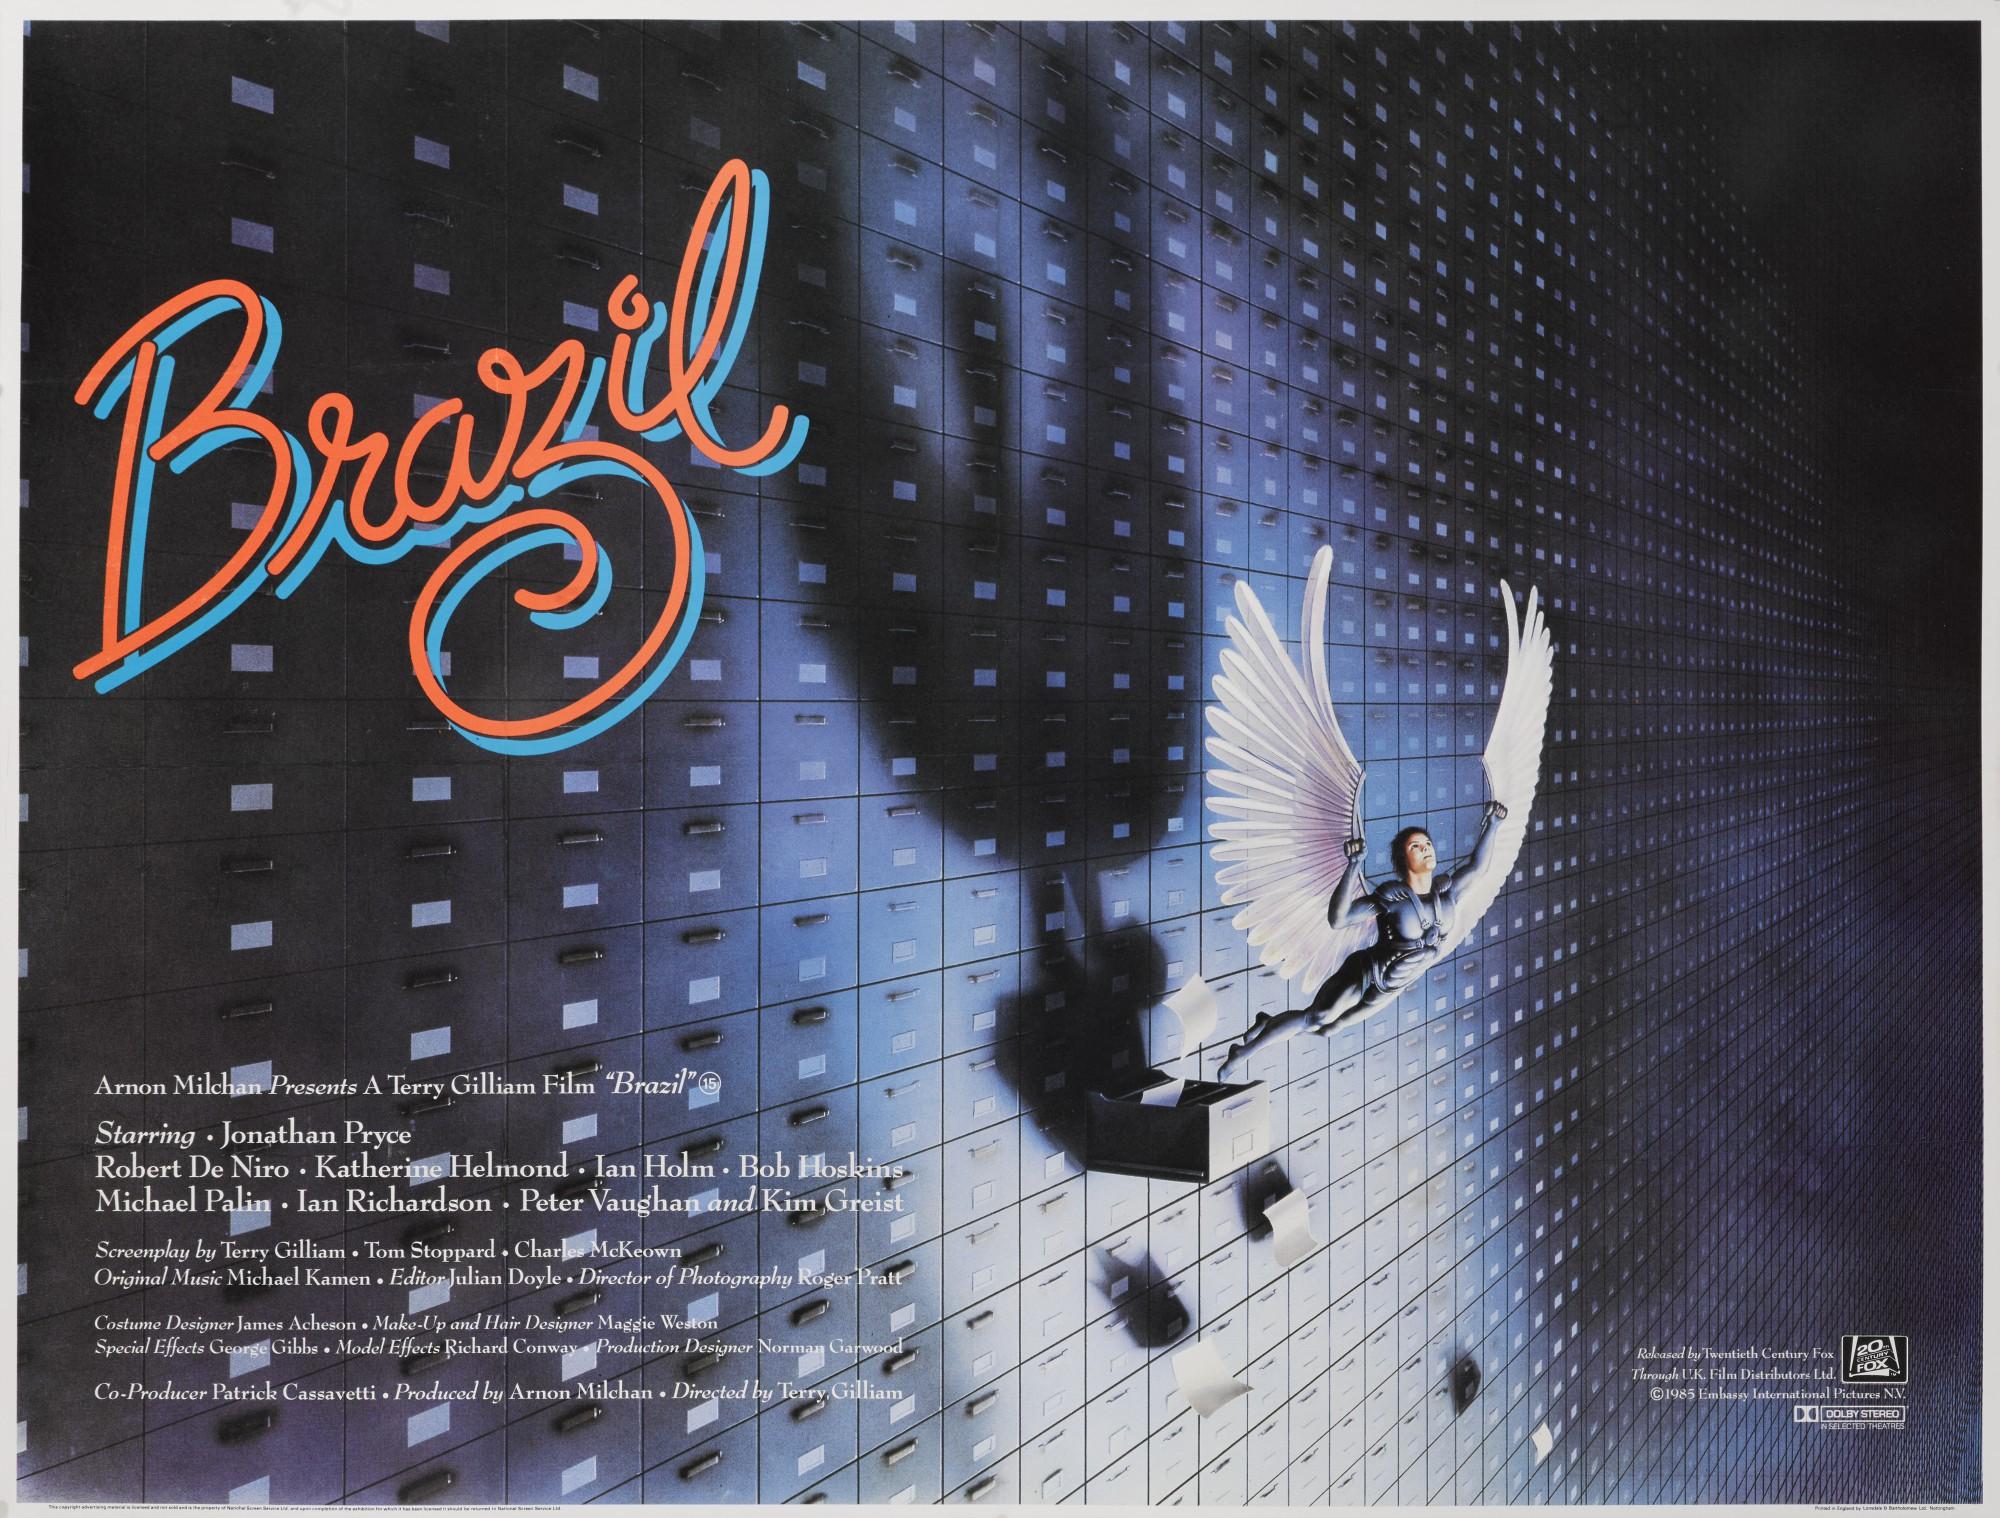 BRAZIL (1985) POSTER, BRITISH